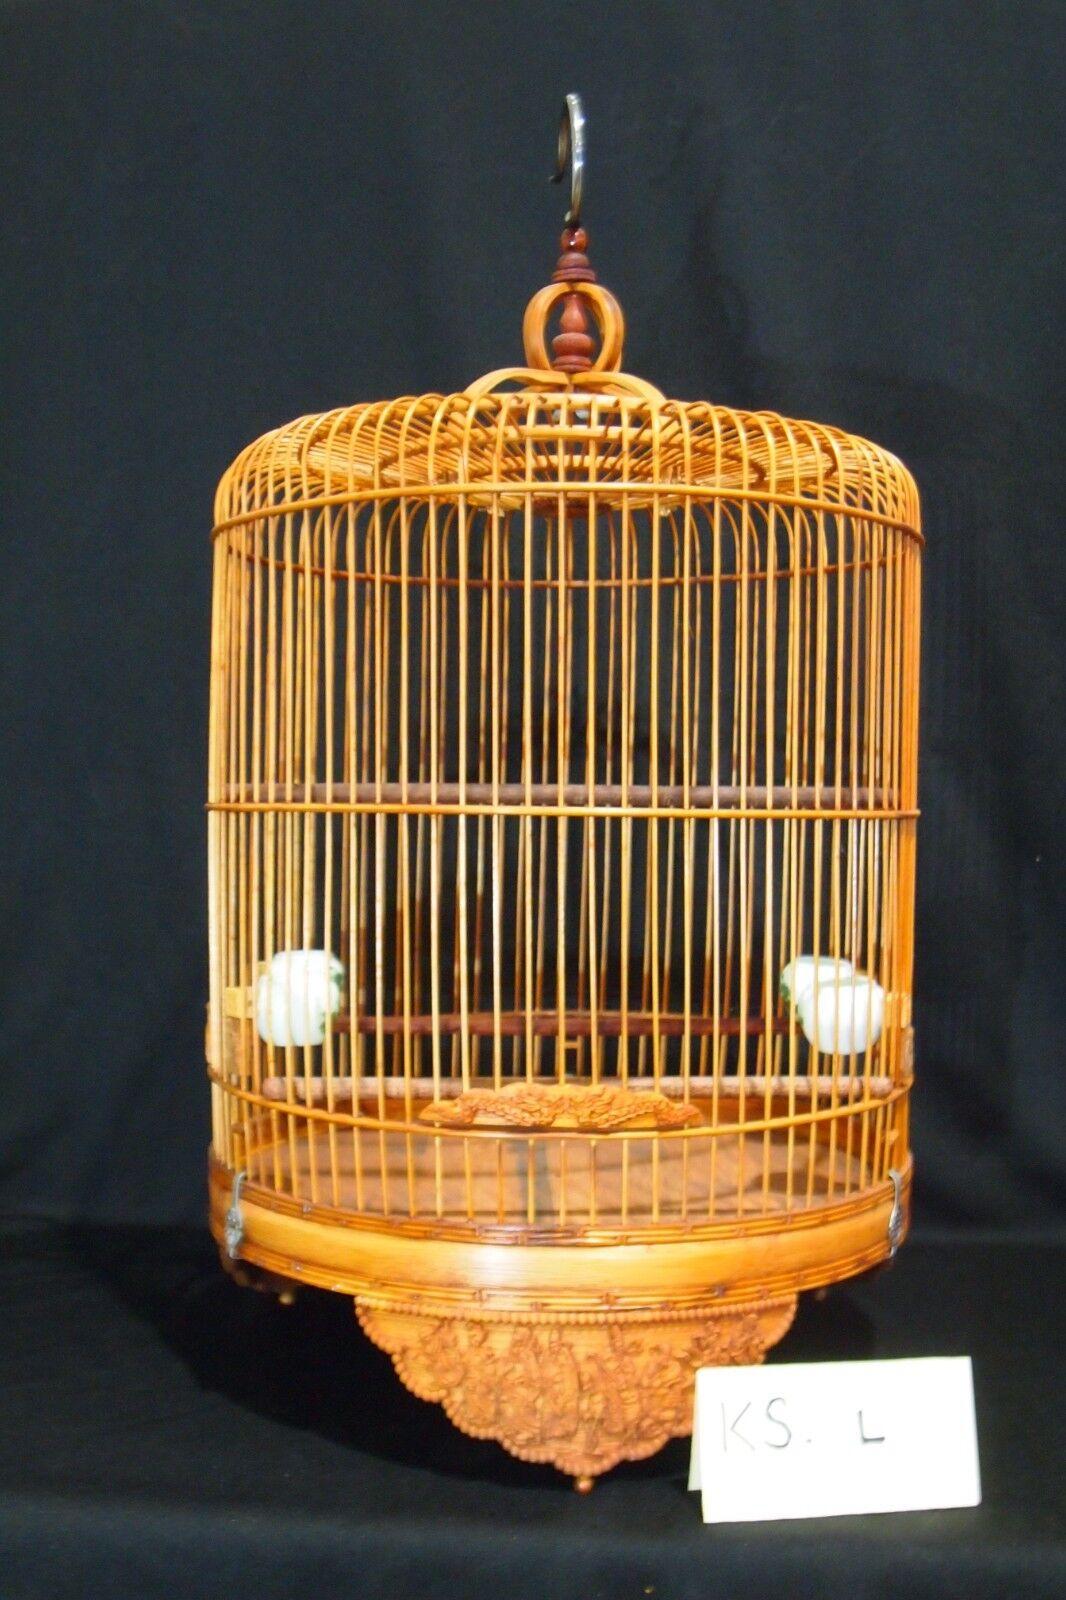 Asian Bamboo Bird Cage KS-L